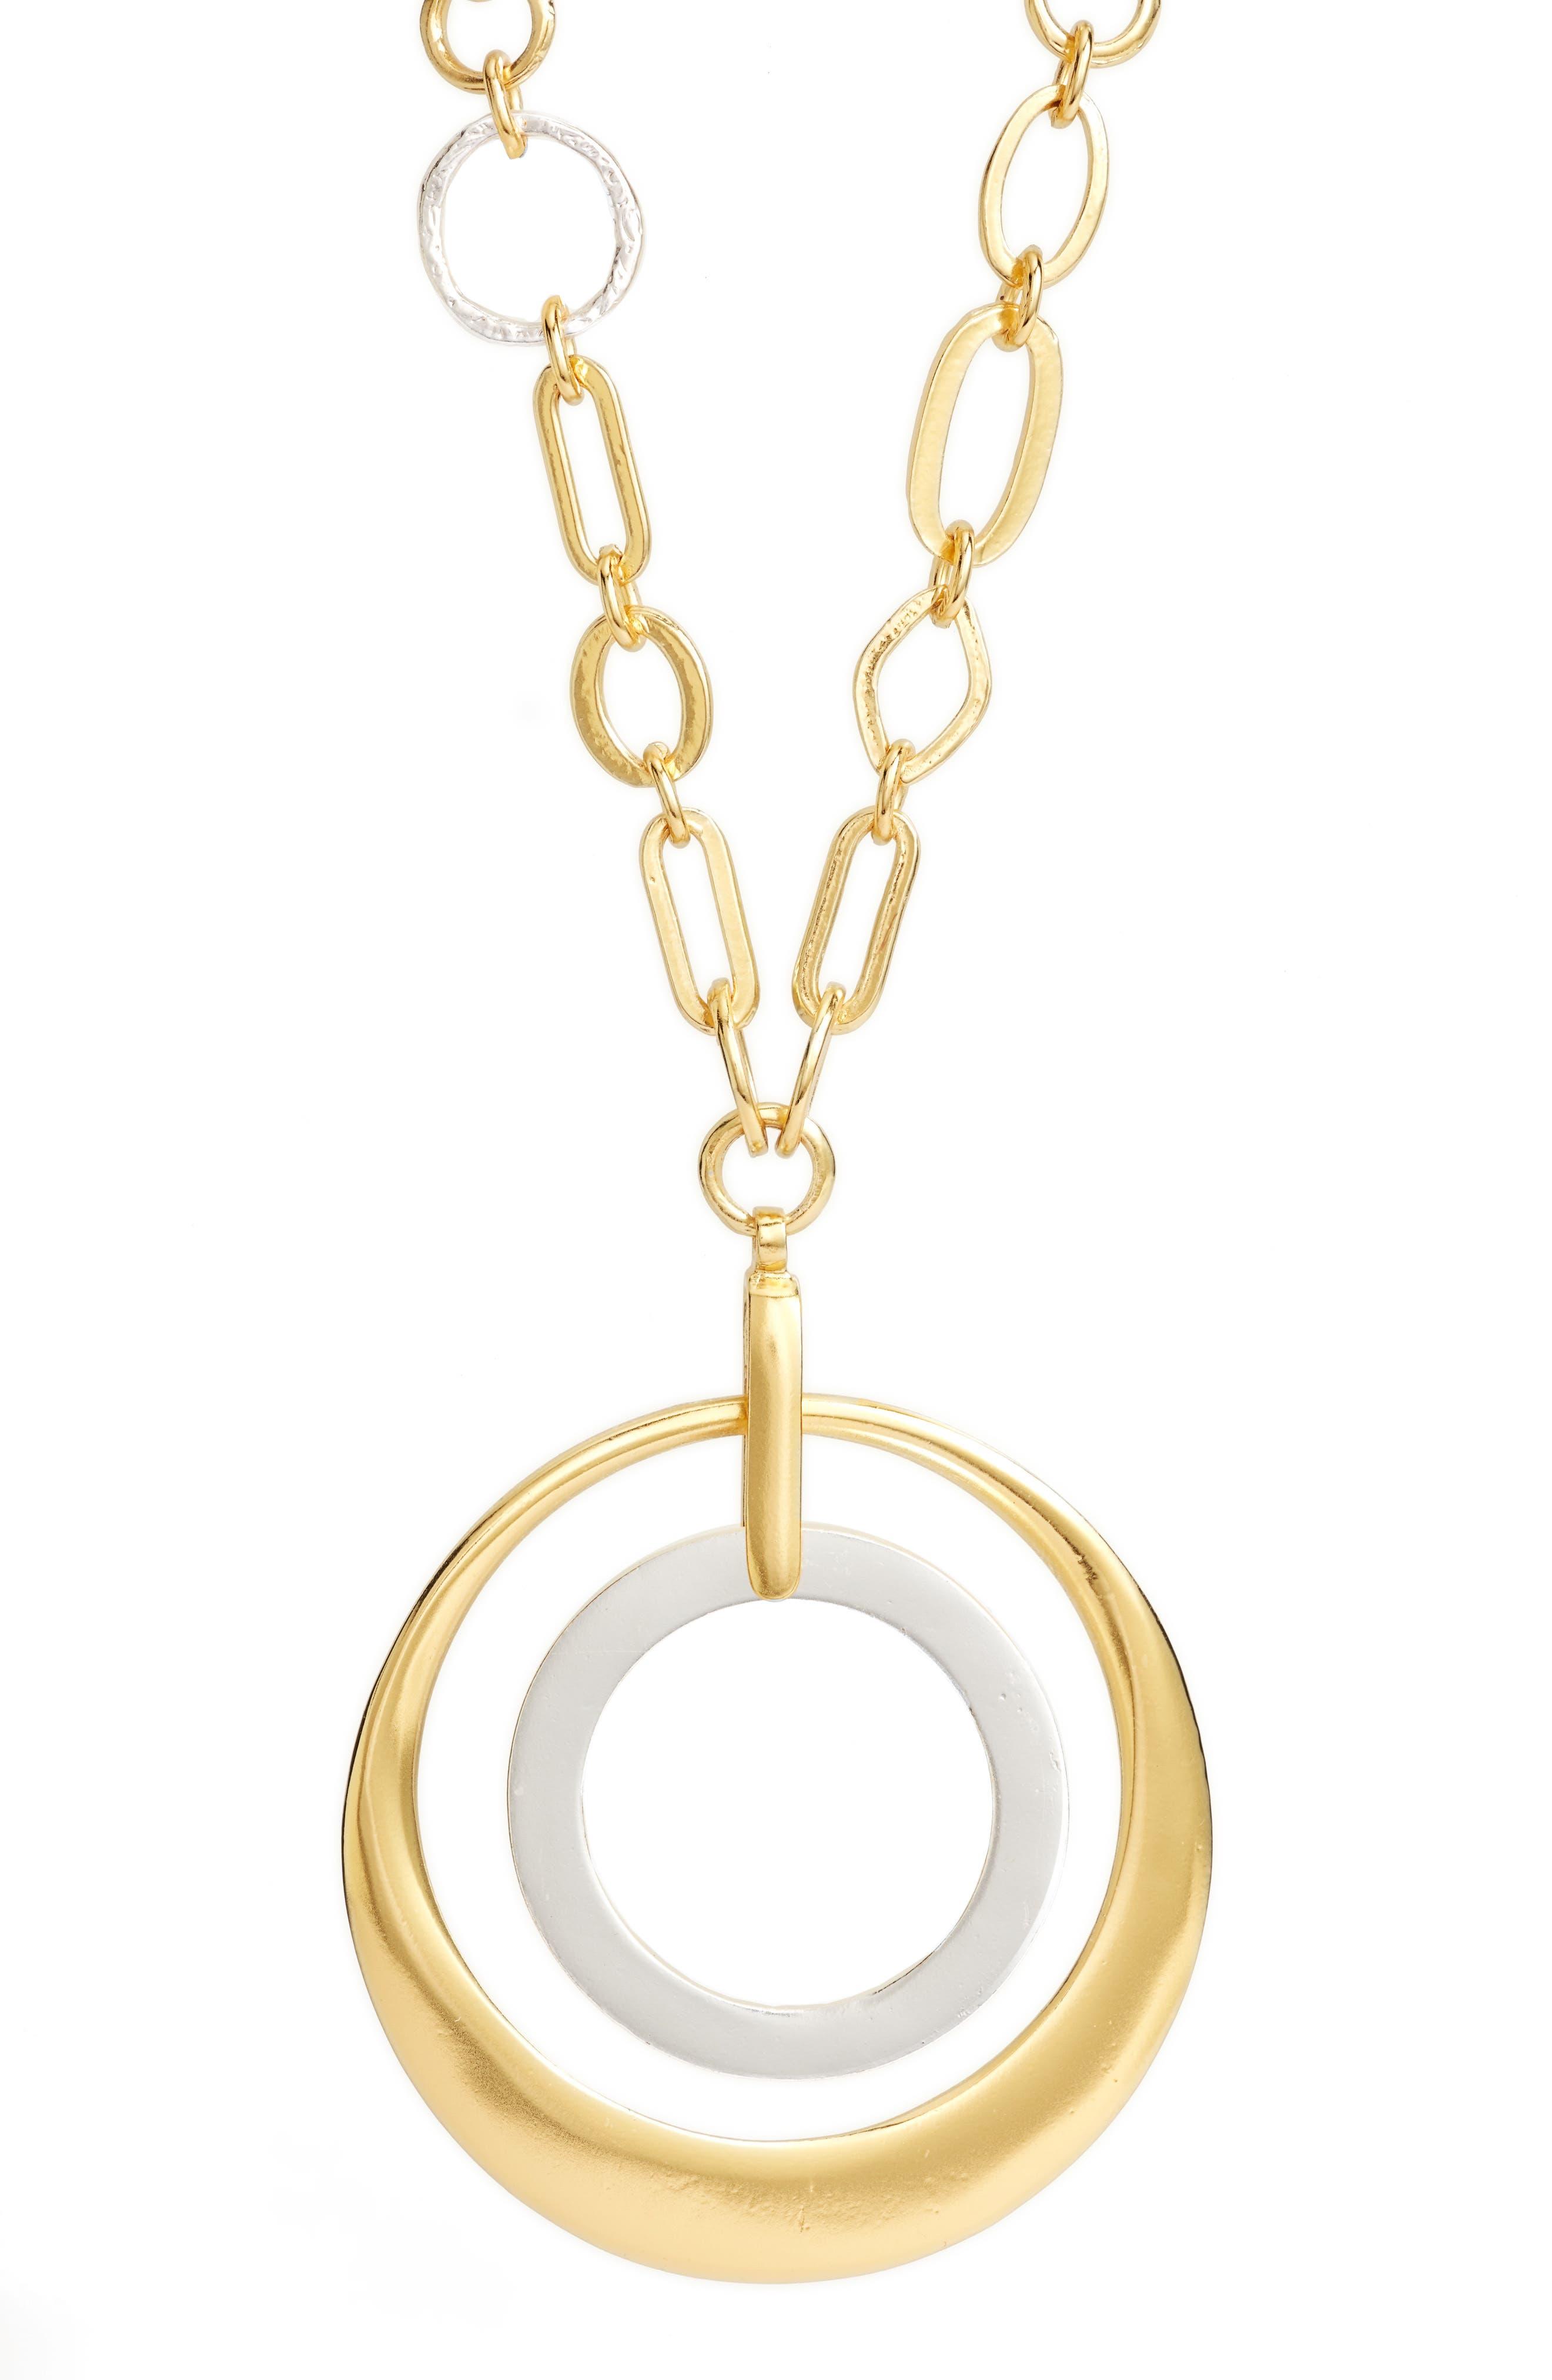 Double Circle Pendant Necklace,                             Alternate thumbnail 2, color,                             GOLD